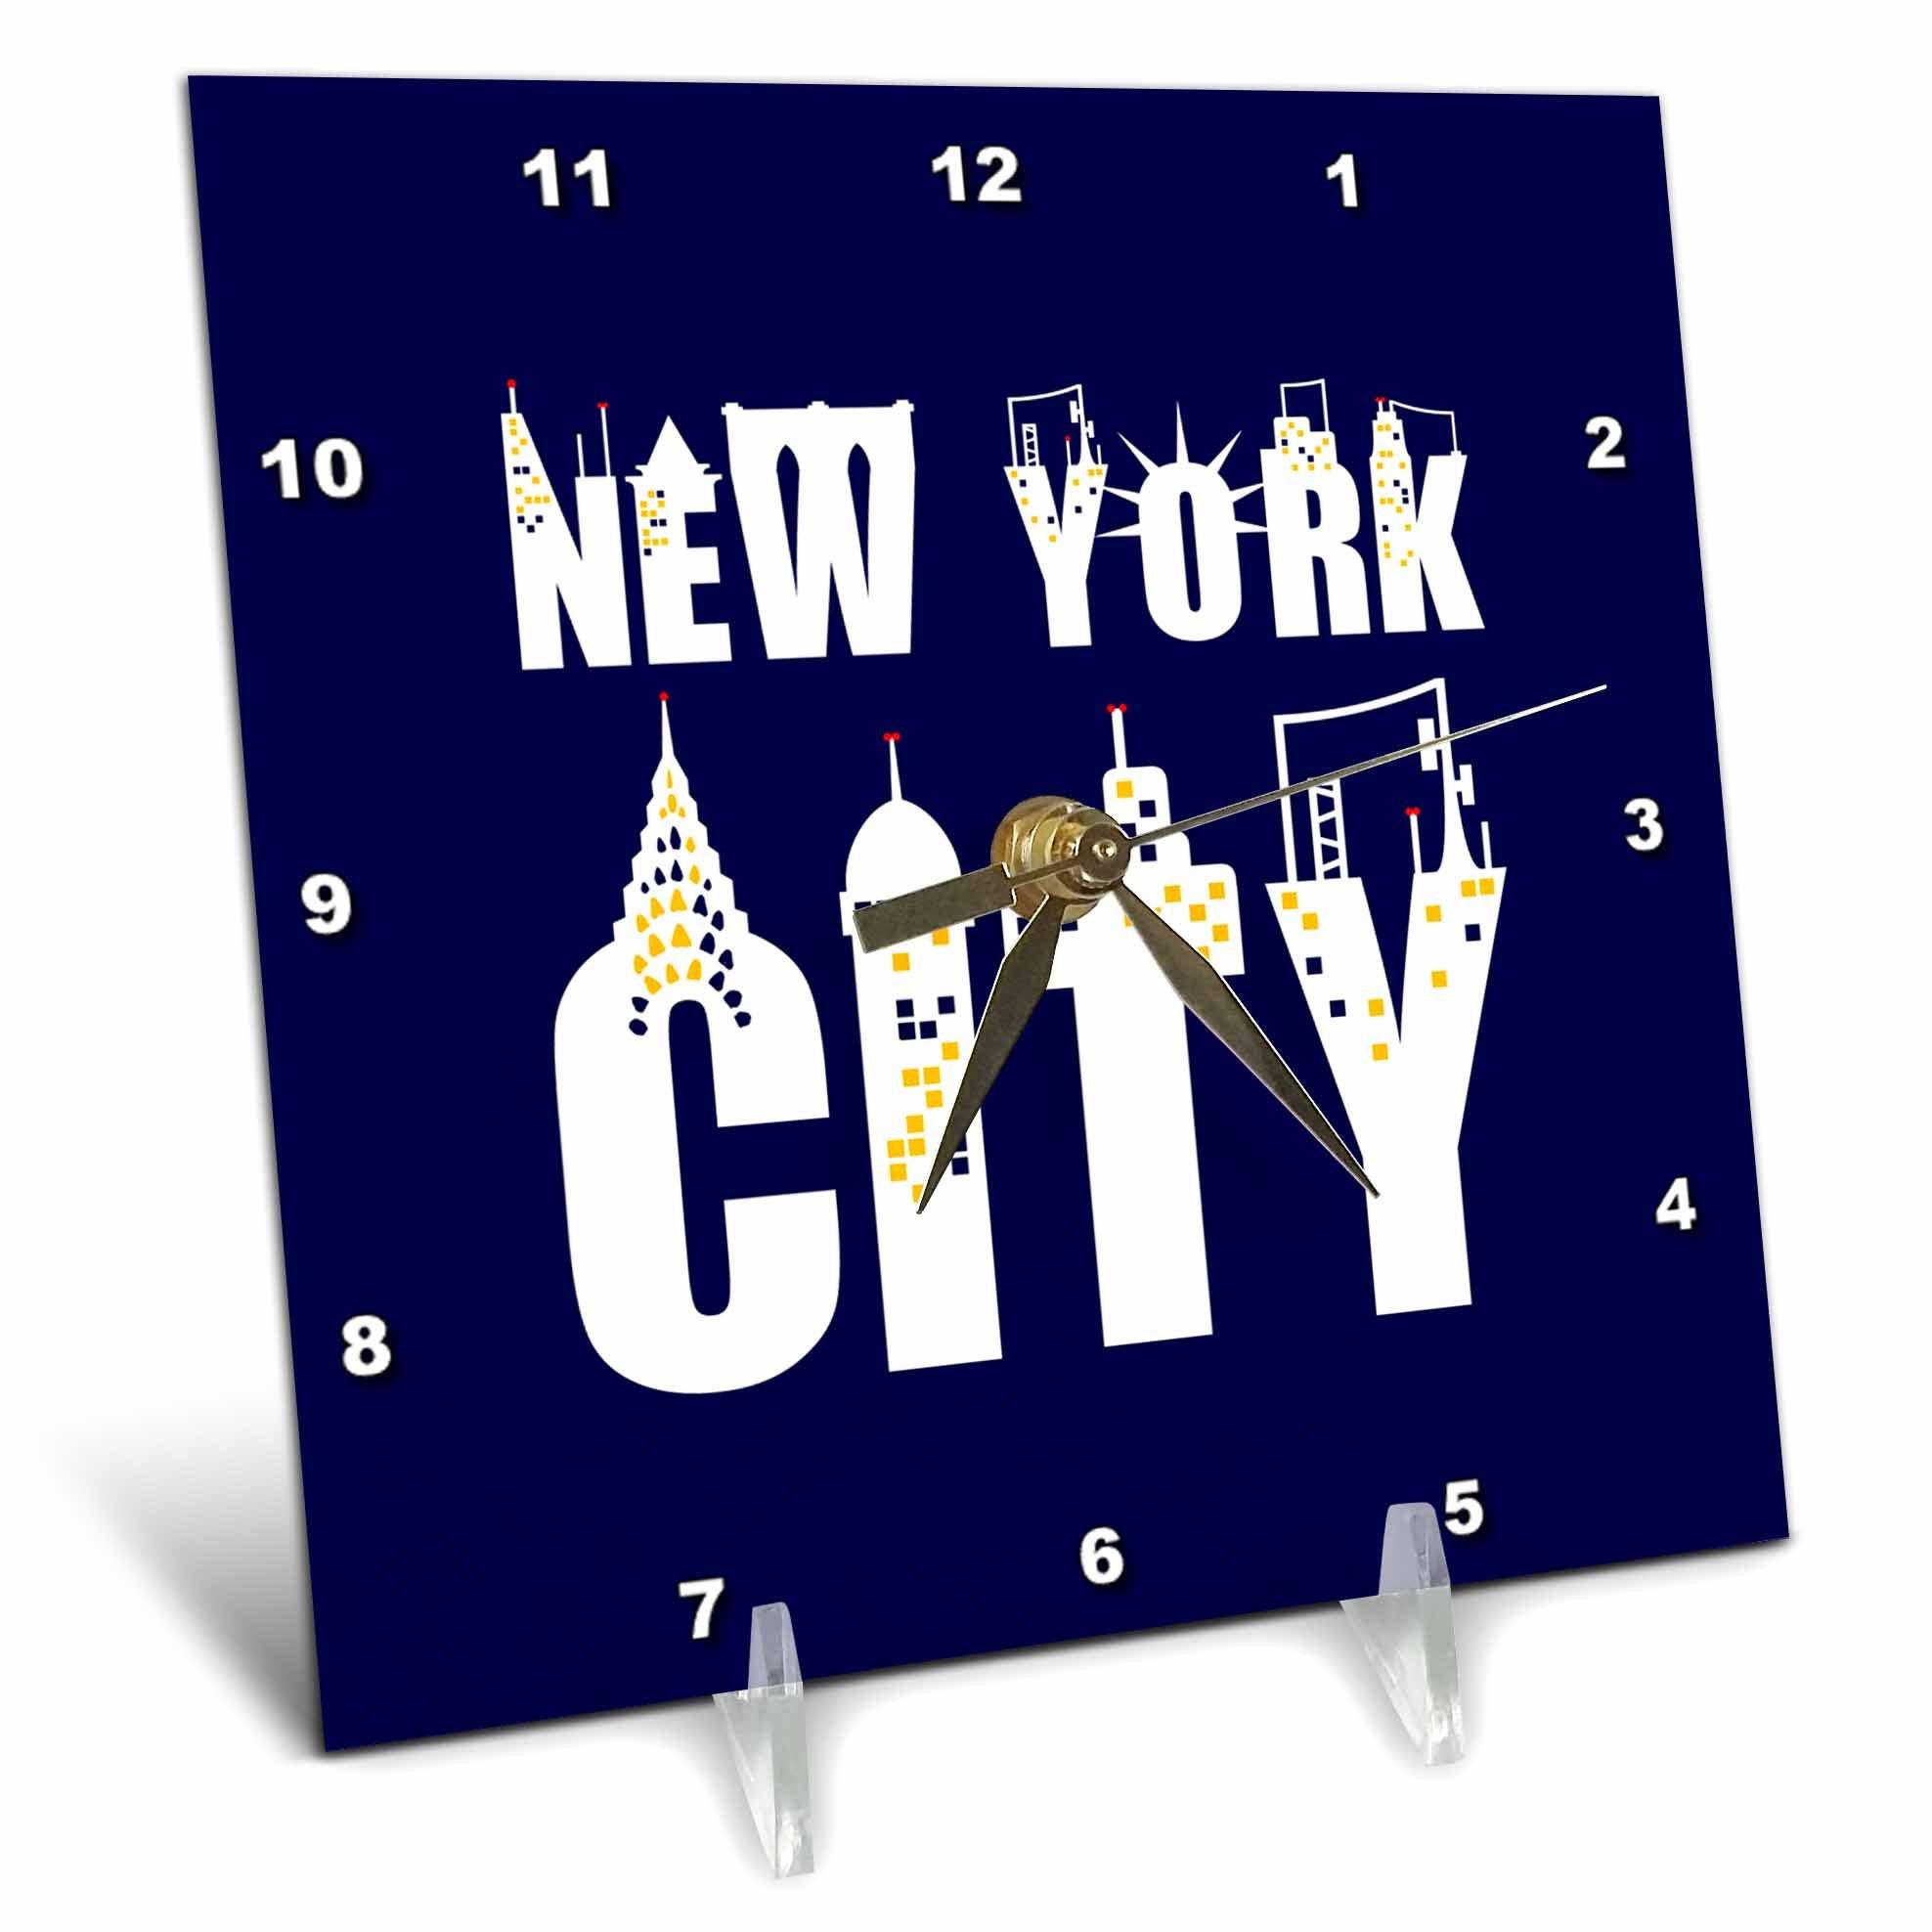 3dRose Alexis Design - American Cities - Elegant text New York City, landmarks, shining windows on blue - 6x6 Desk Clock (dc_286455_1)